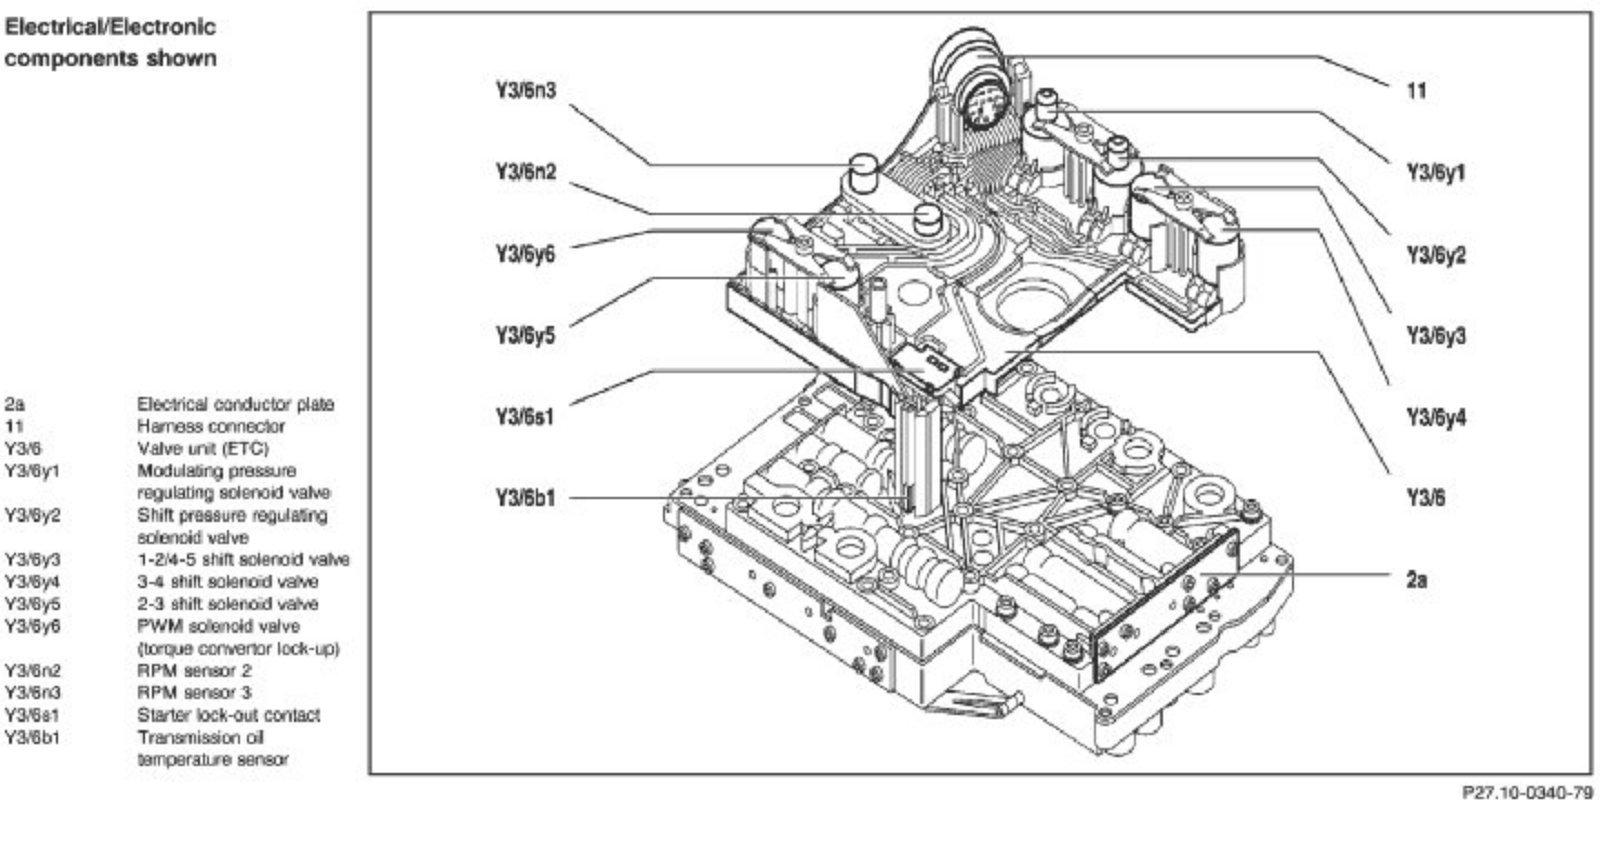 i read my engine codes an the input turbine speed sencer circuitInput Turbine Speed Sensor Circuit Http Wwwjustanswercom Mercedes #1